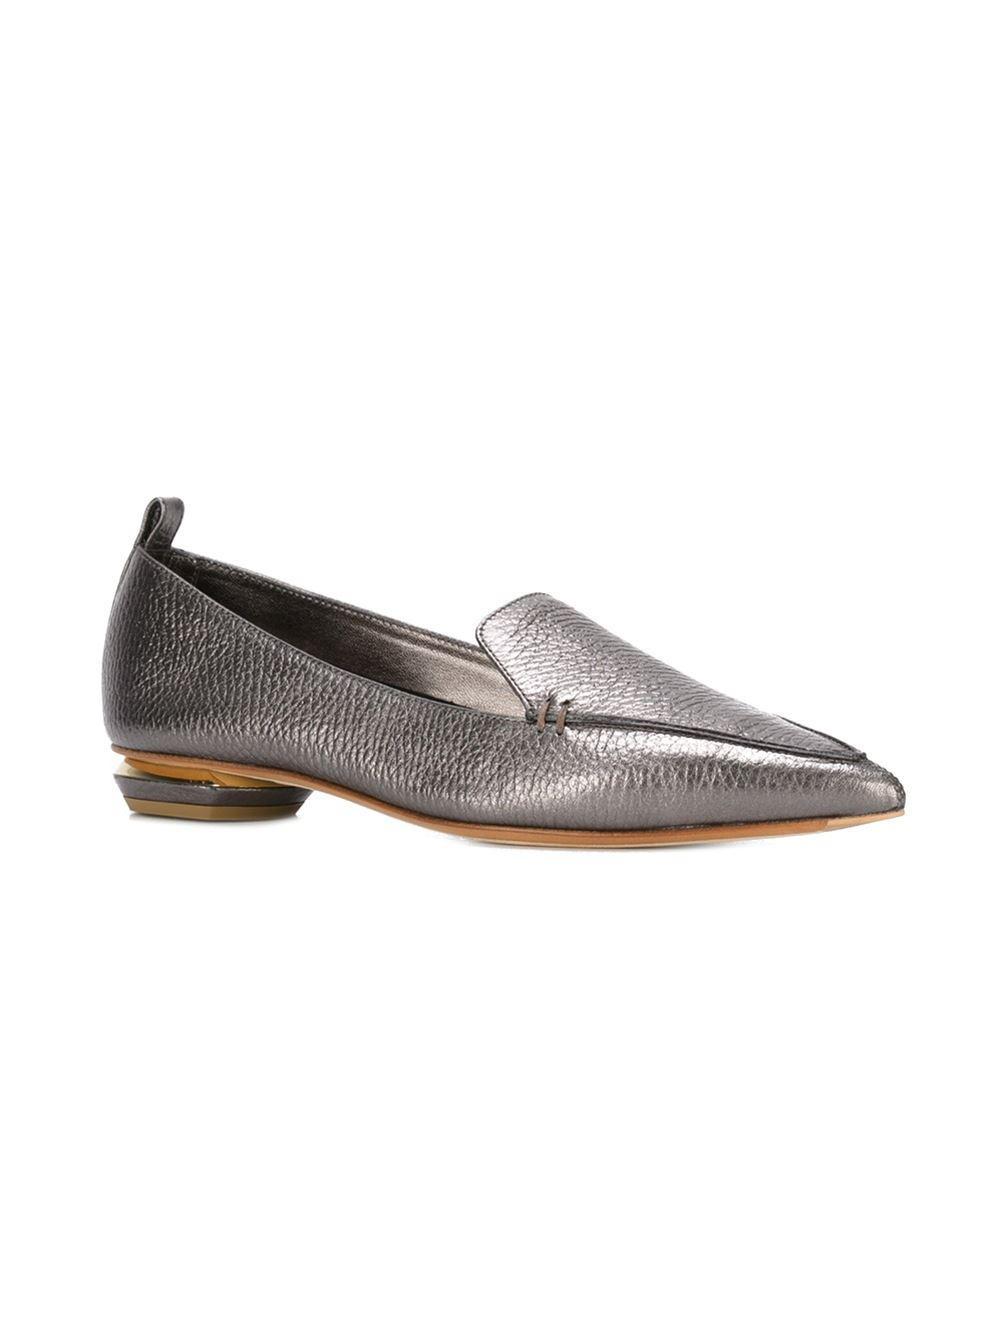 0cd2e3b8983 Nicholas Kirkwood - Purple Beya Metallic-Leather Loafers - Lyst. View  fullscreen